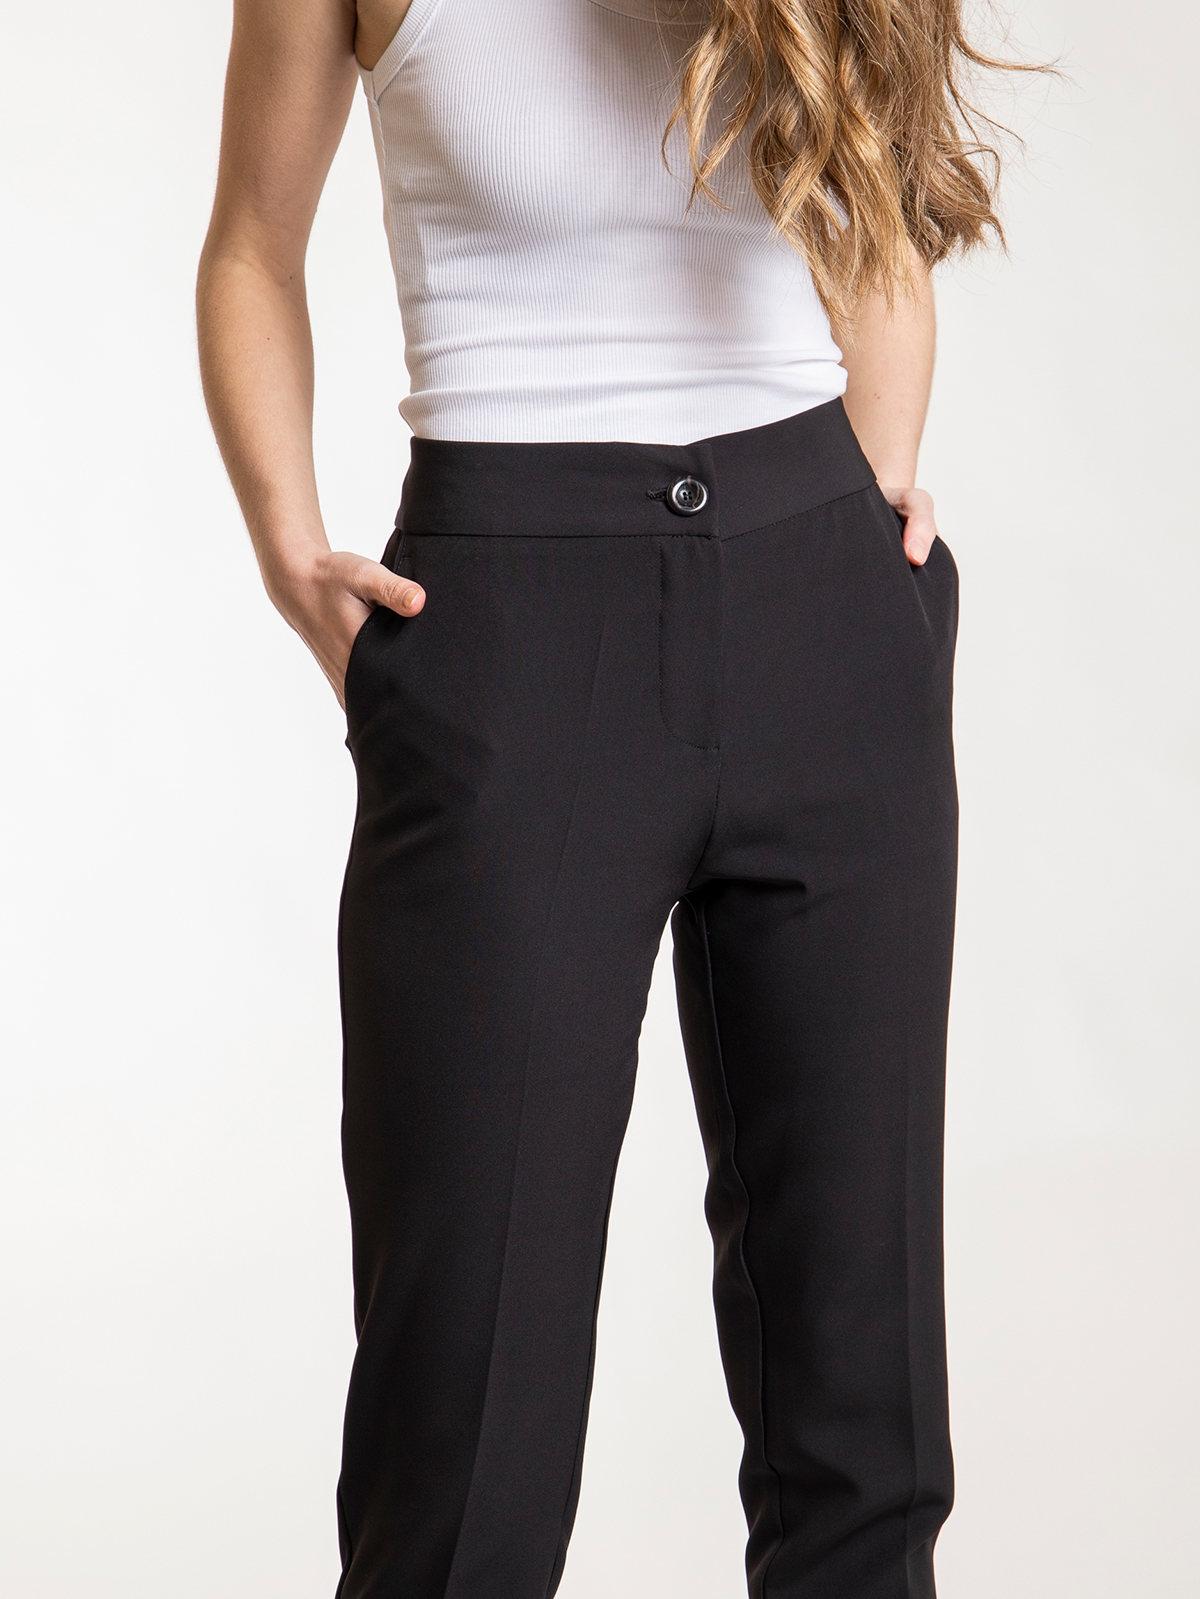 Pantalón mujer tiro alto bolsillos Negro